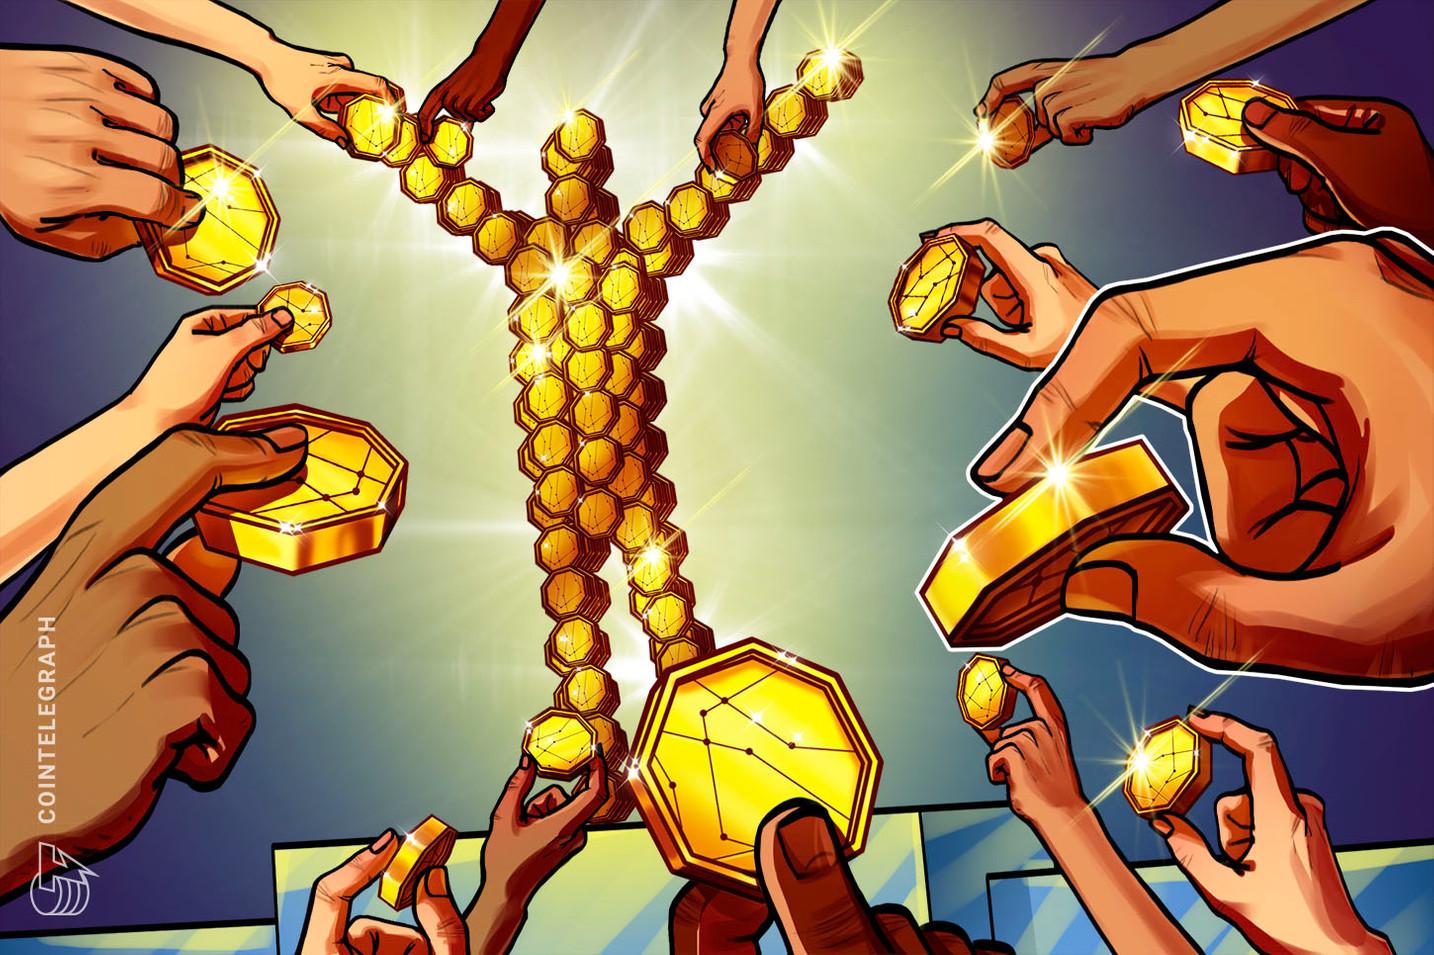 The next big crypto market could be fantasy sports, says Messari